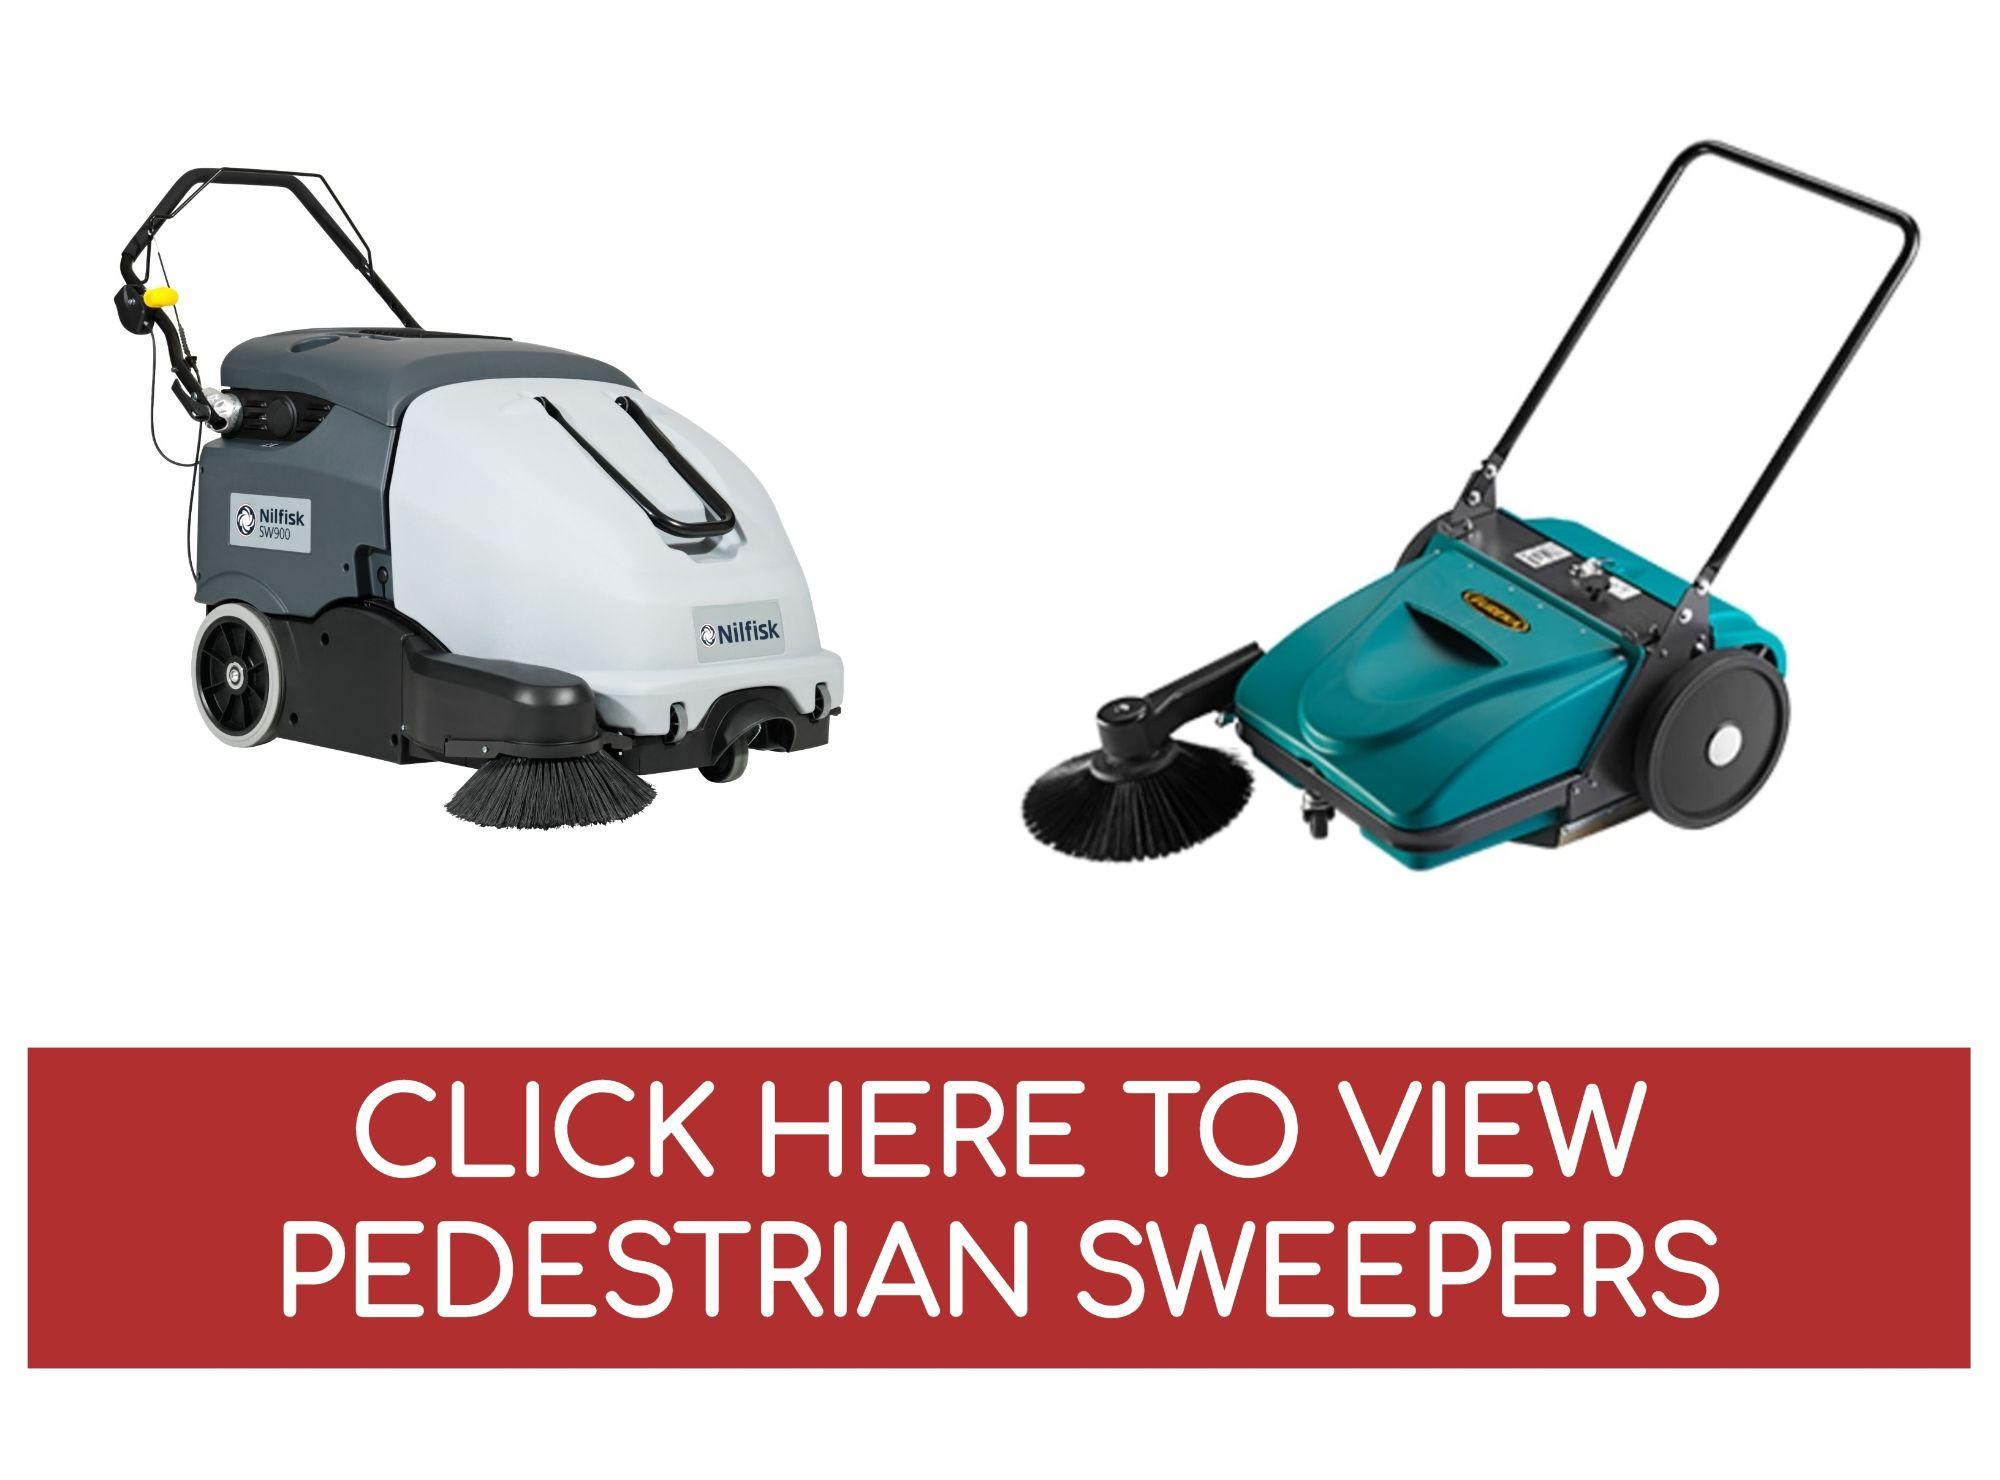 Pedestrian Sweepers